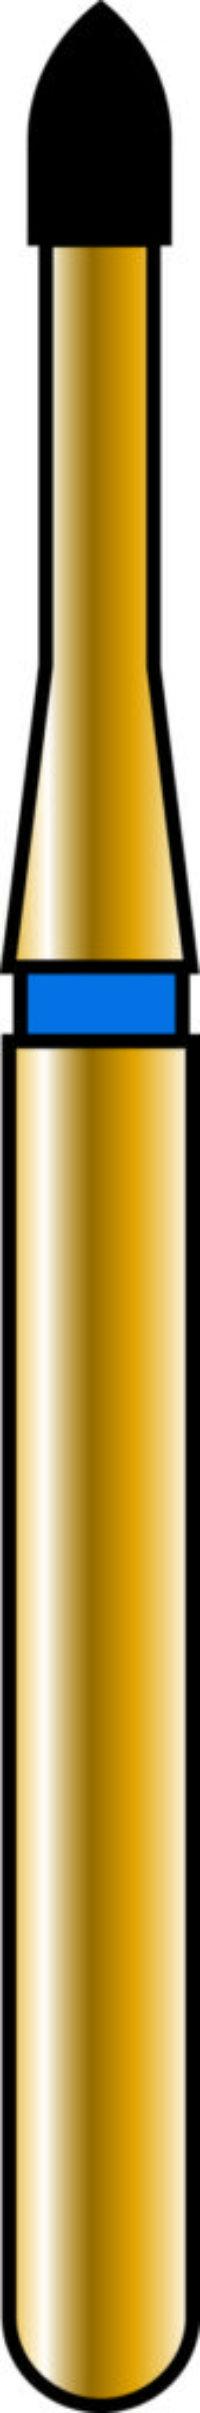 Flame 12-2mm Gold Diamond Bur